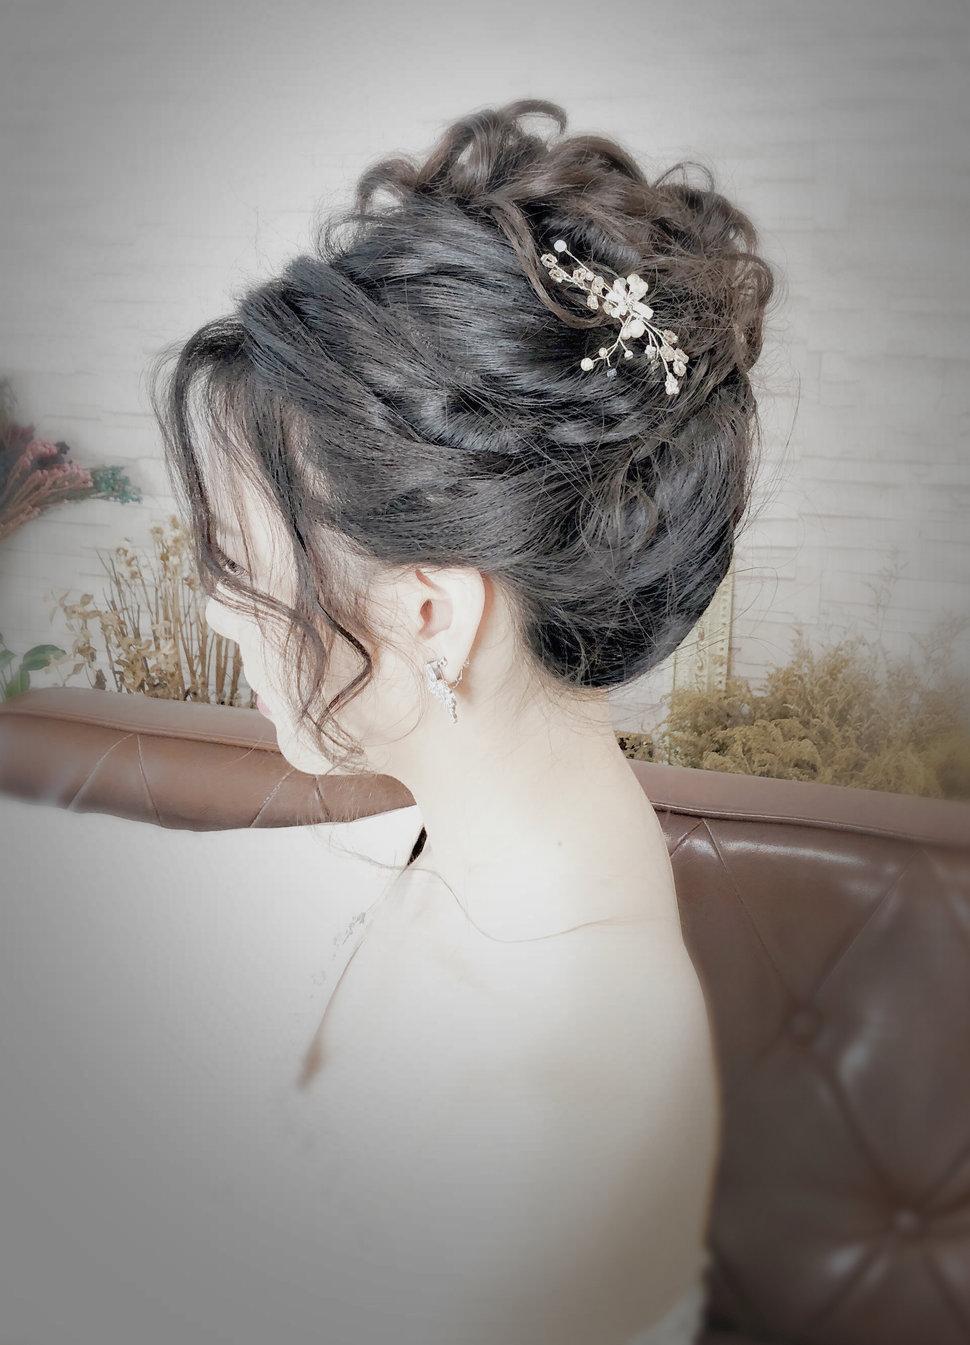 E51483B1-2C46-4196-80D4-AA4E54E16DA5 - YI MO 米米 makeup Stud《結婚吧》